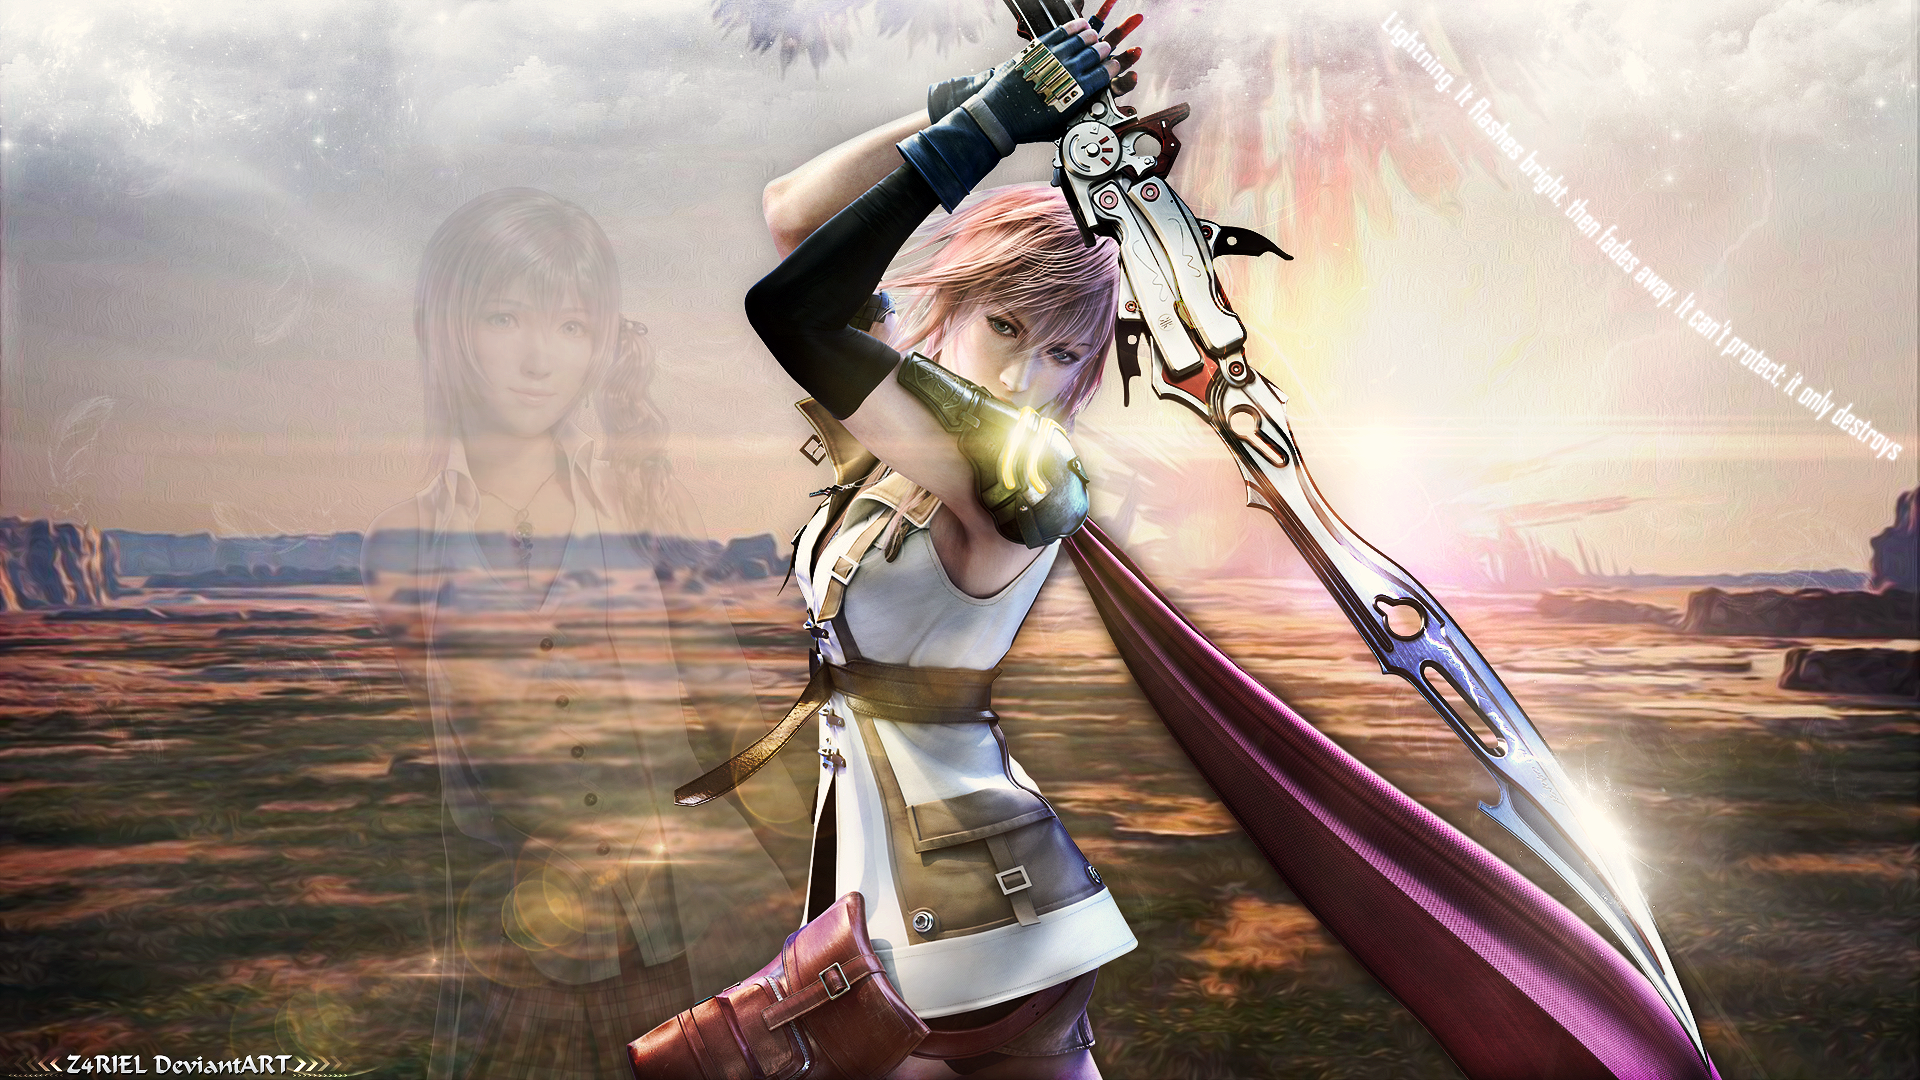 Wallpaper Lightning Final Fantasy Xiii By Z4riel On Deviantart